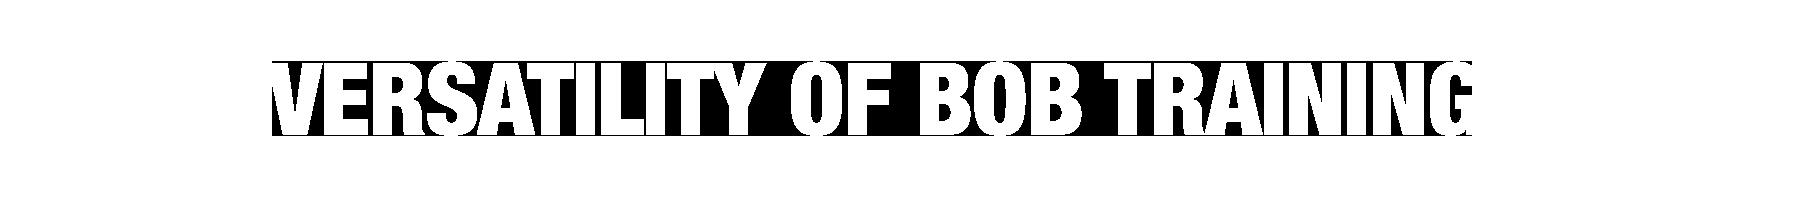 Versatility of BOB Training